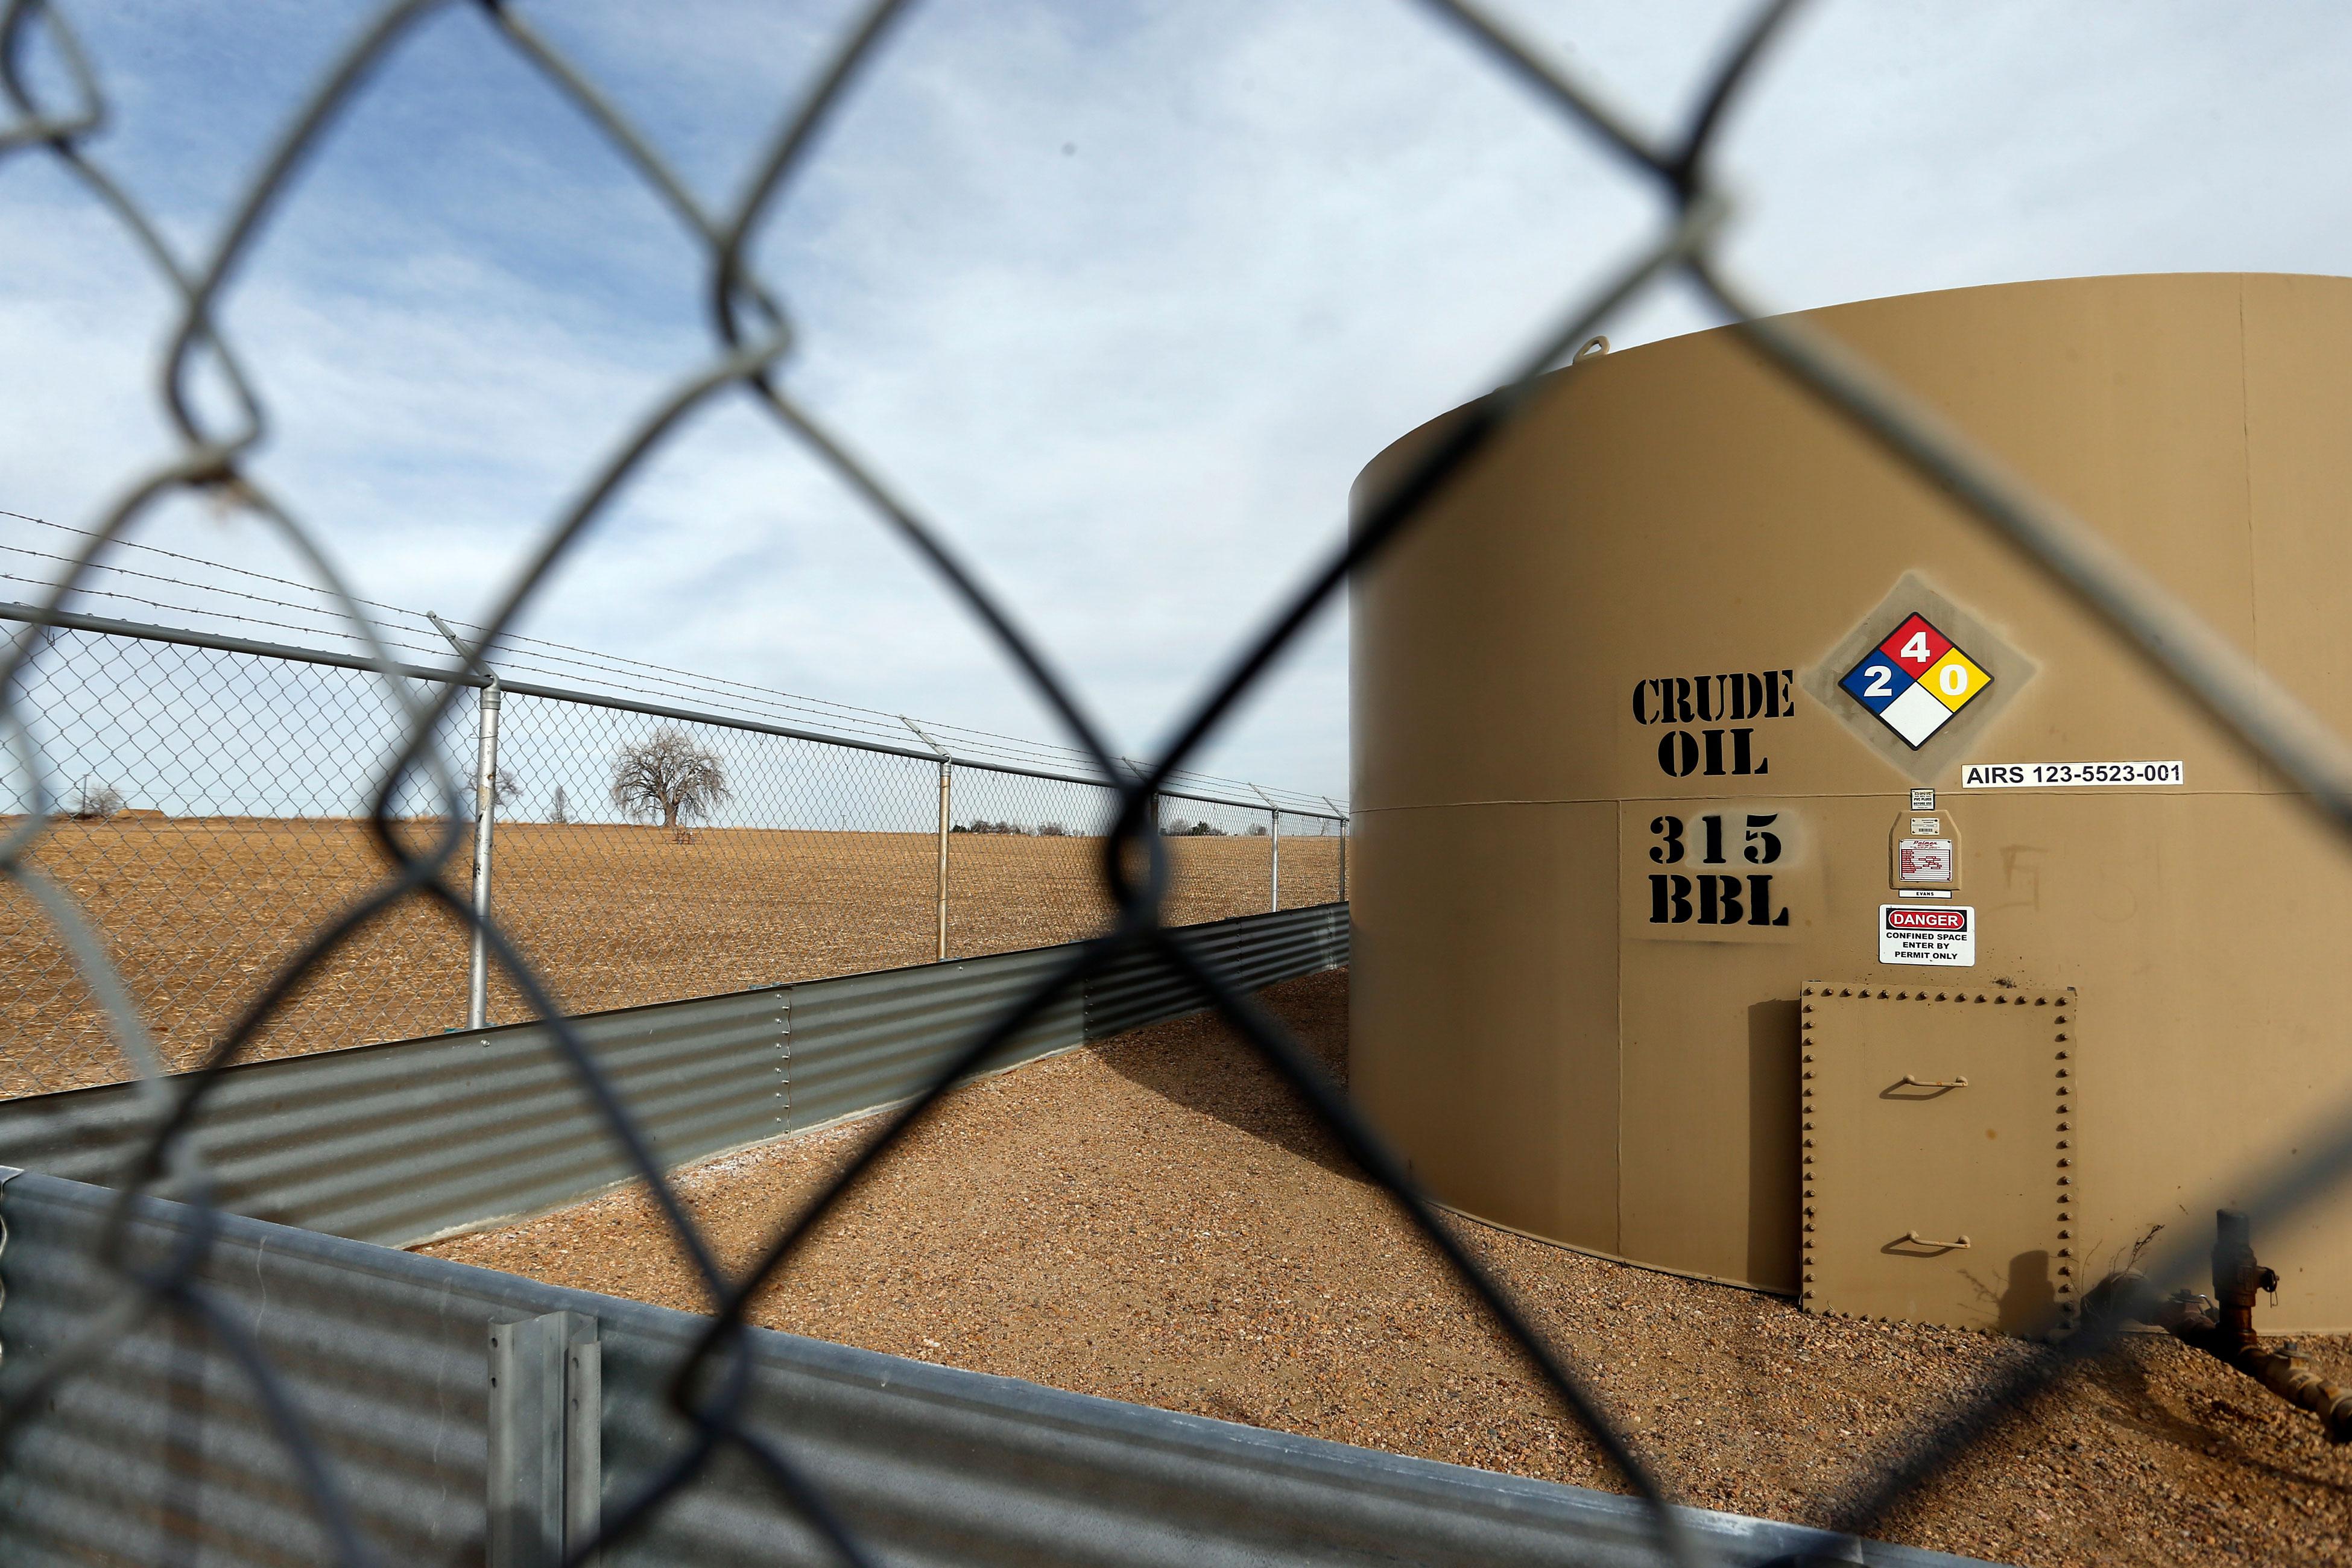 Audio: Weld County Oil Tank - AP